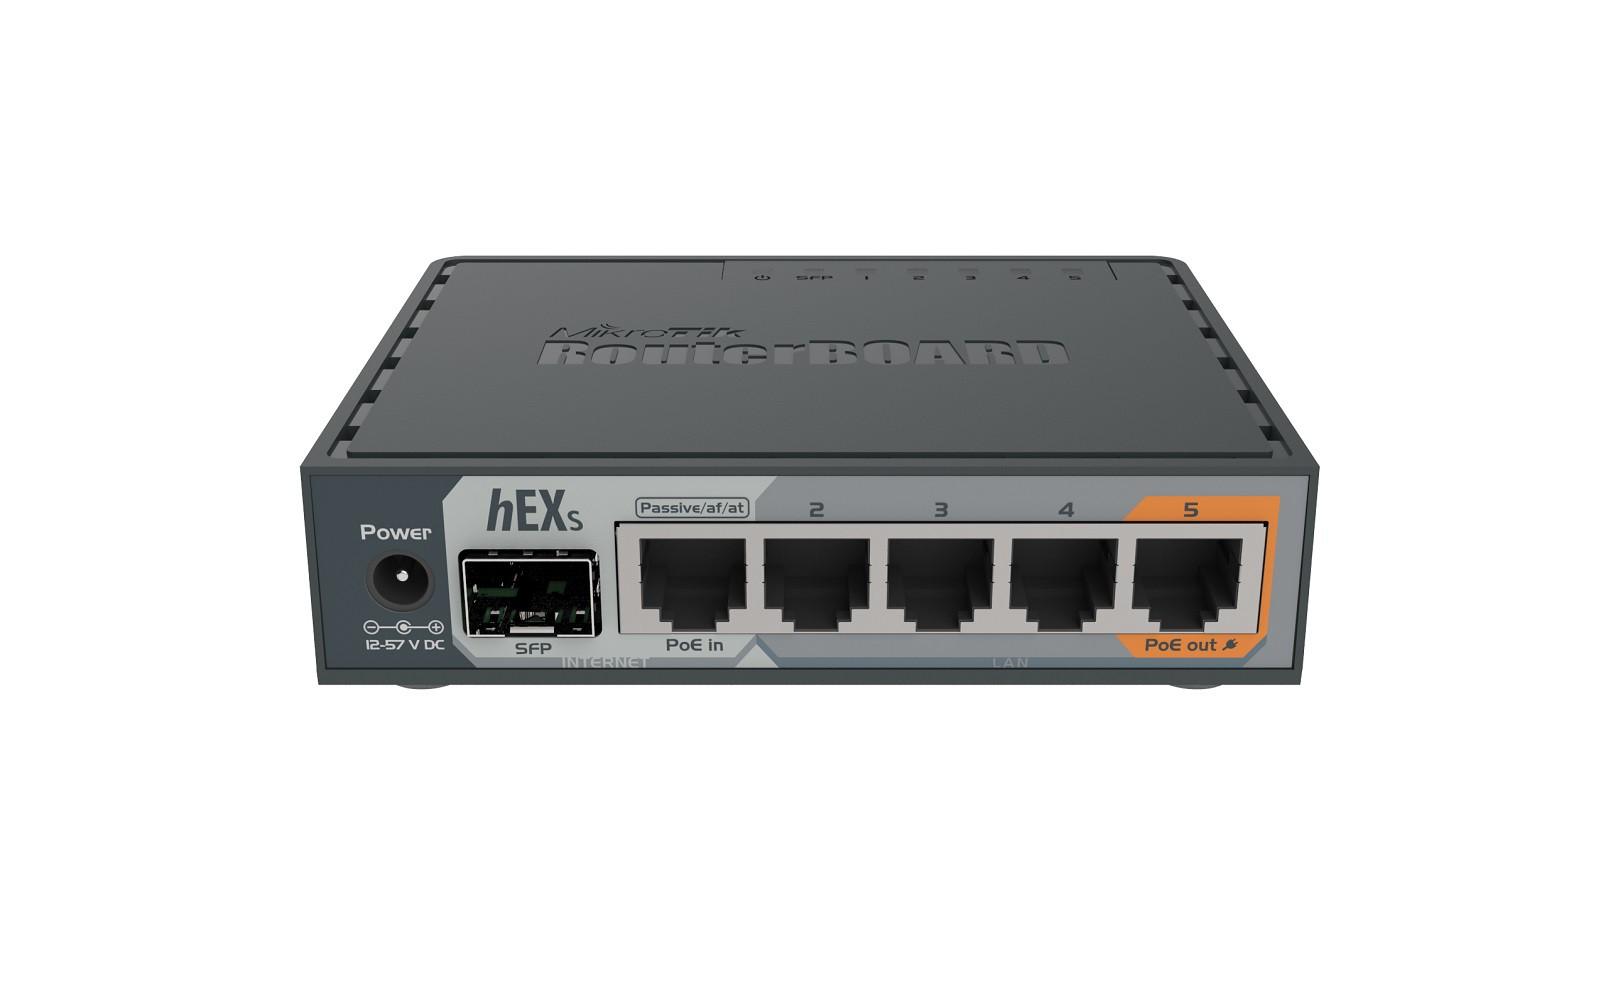 Roteador Mikrotik hEX S RB760iGS 5x1Gbps +1SFP 880mhz 256MB   - TNTinfo Loja